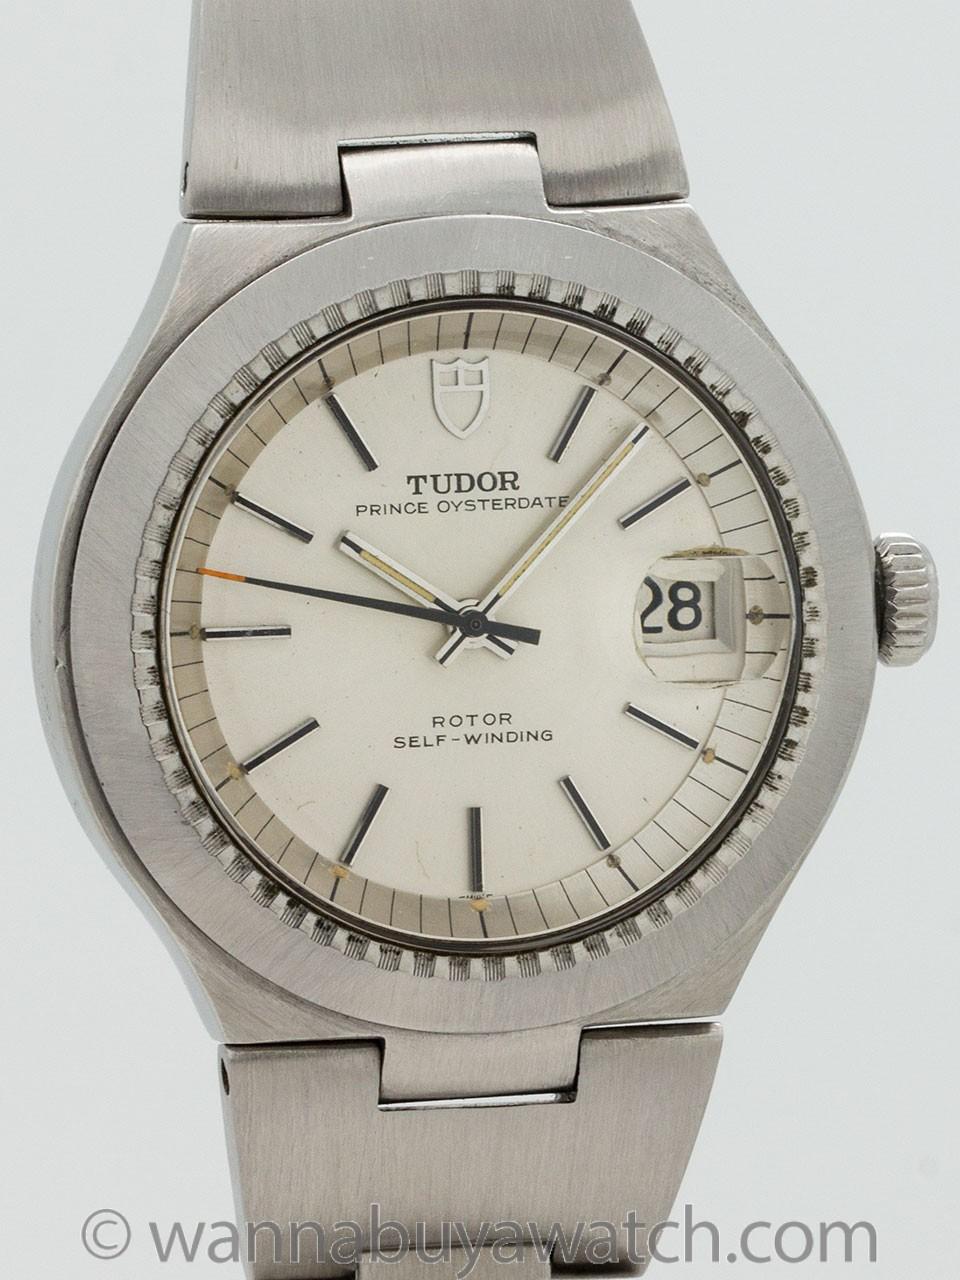 Tudor Prince Oysterdate ref 9101/0 circa 1973